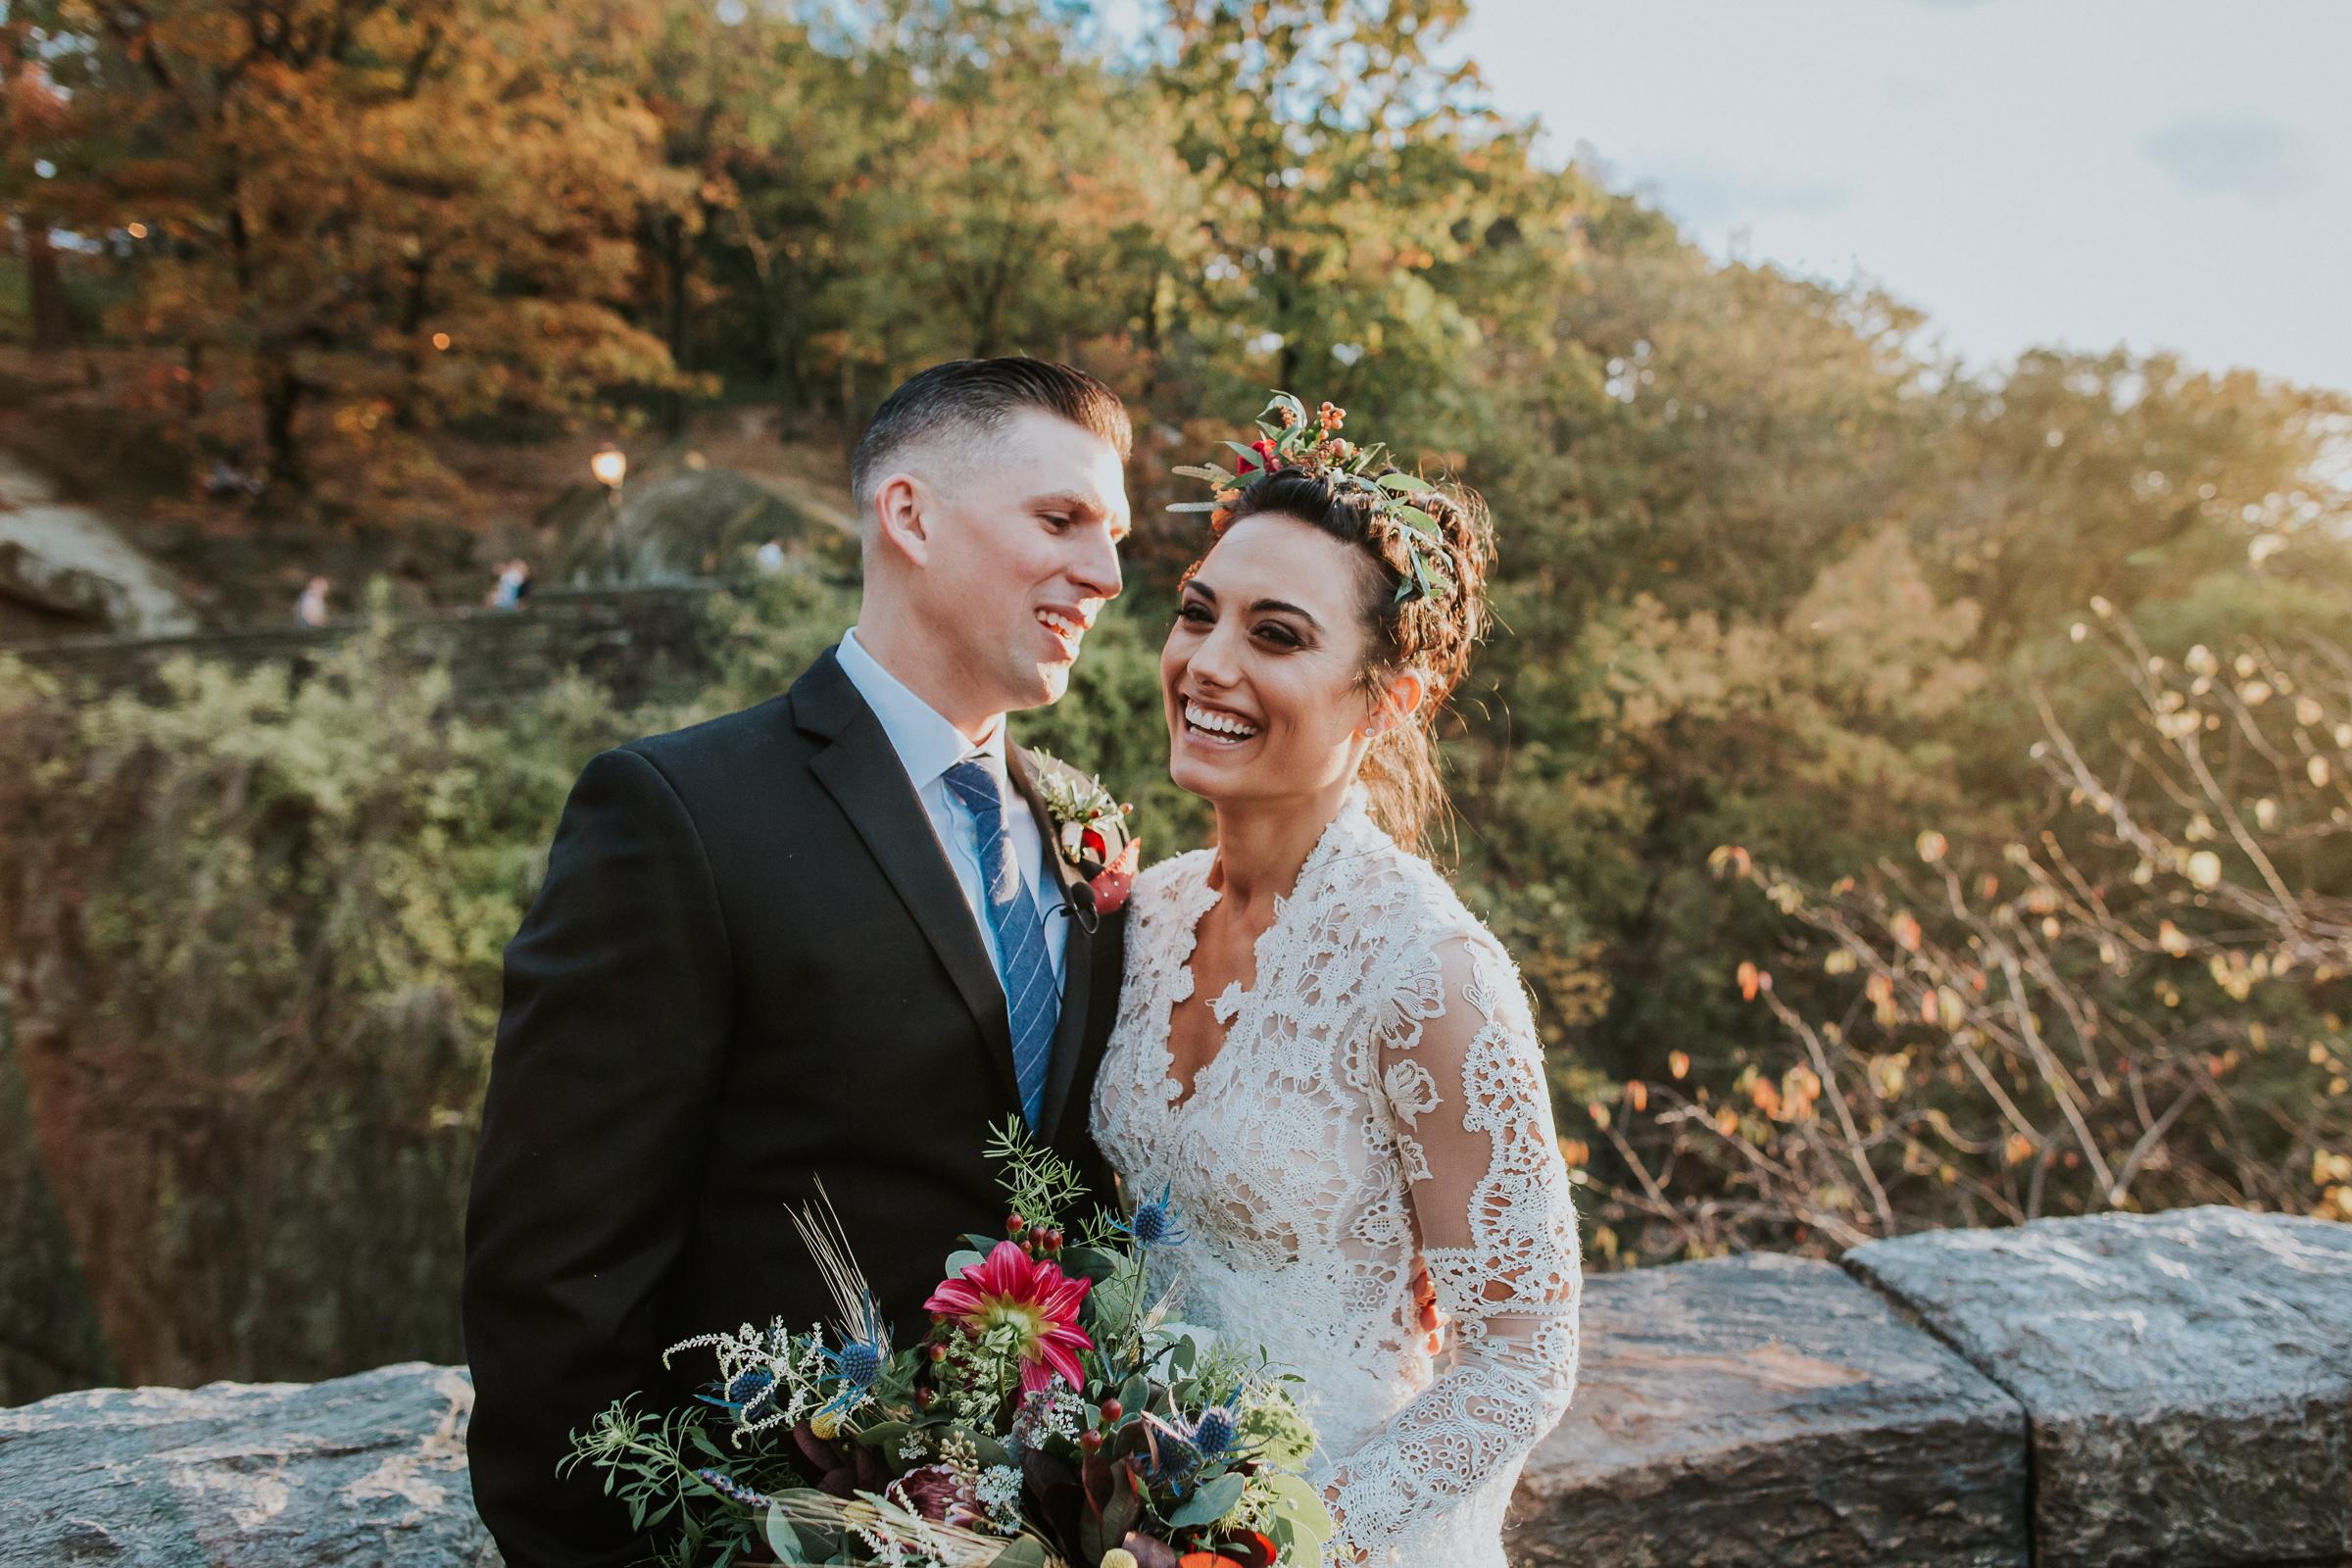 New-York-Documentary-Wedding-Photography-Best-Of-2017-by-Elvira-Kalviste-Photography-126.jpg